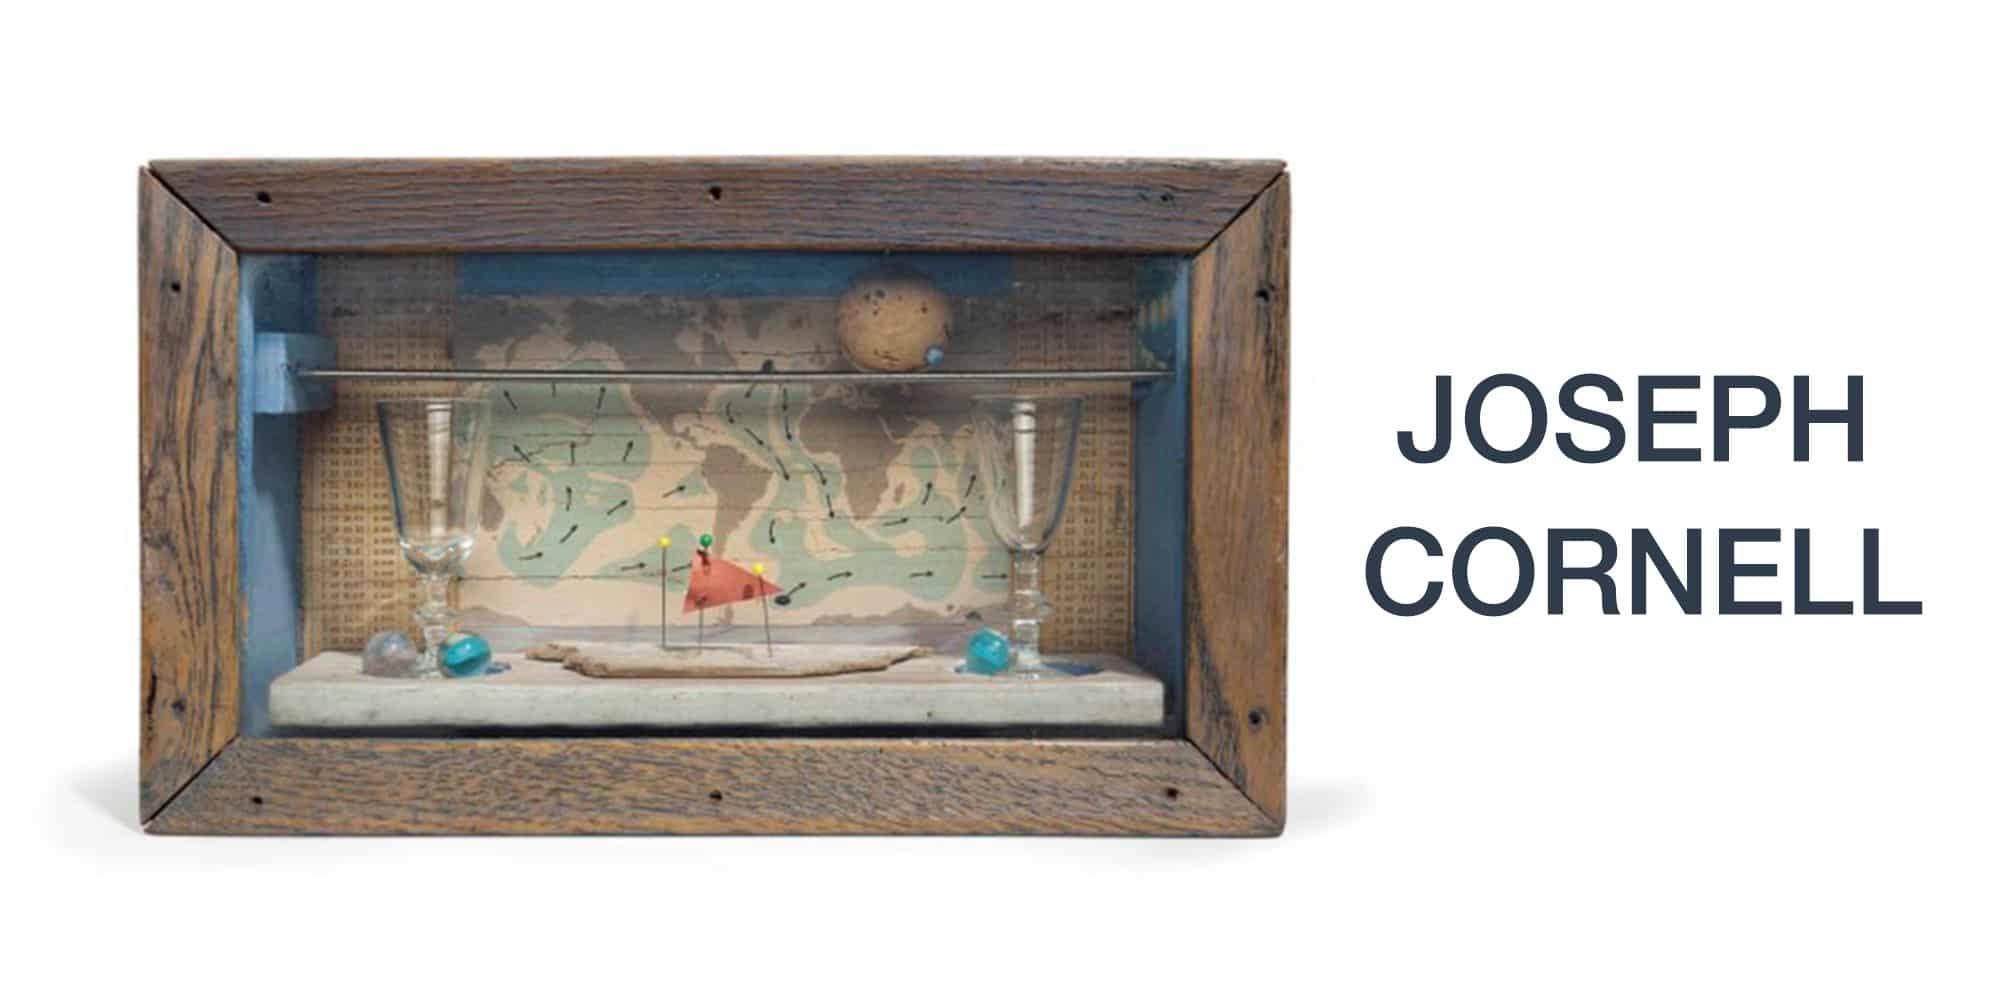 Art Miami 2018 Jonathan Novak Joseph Cornell